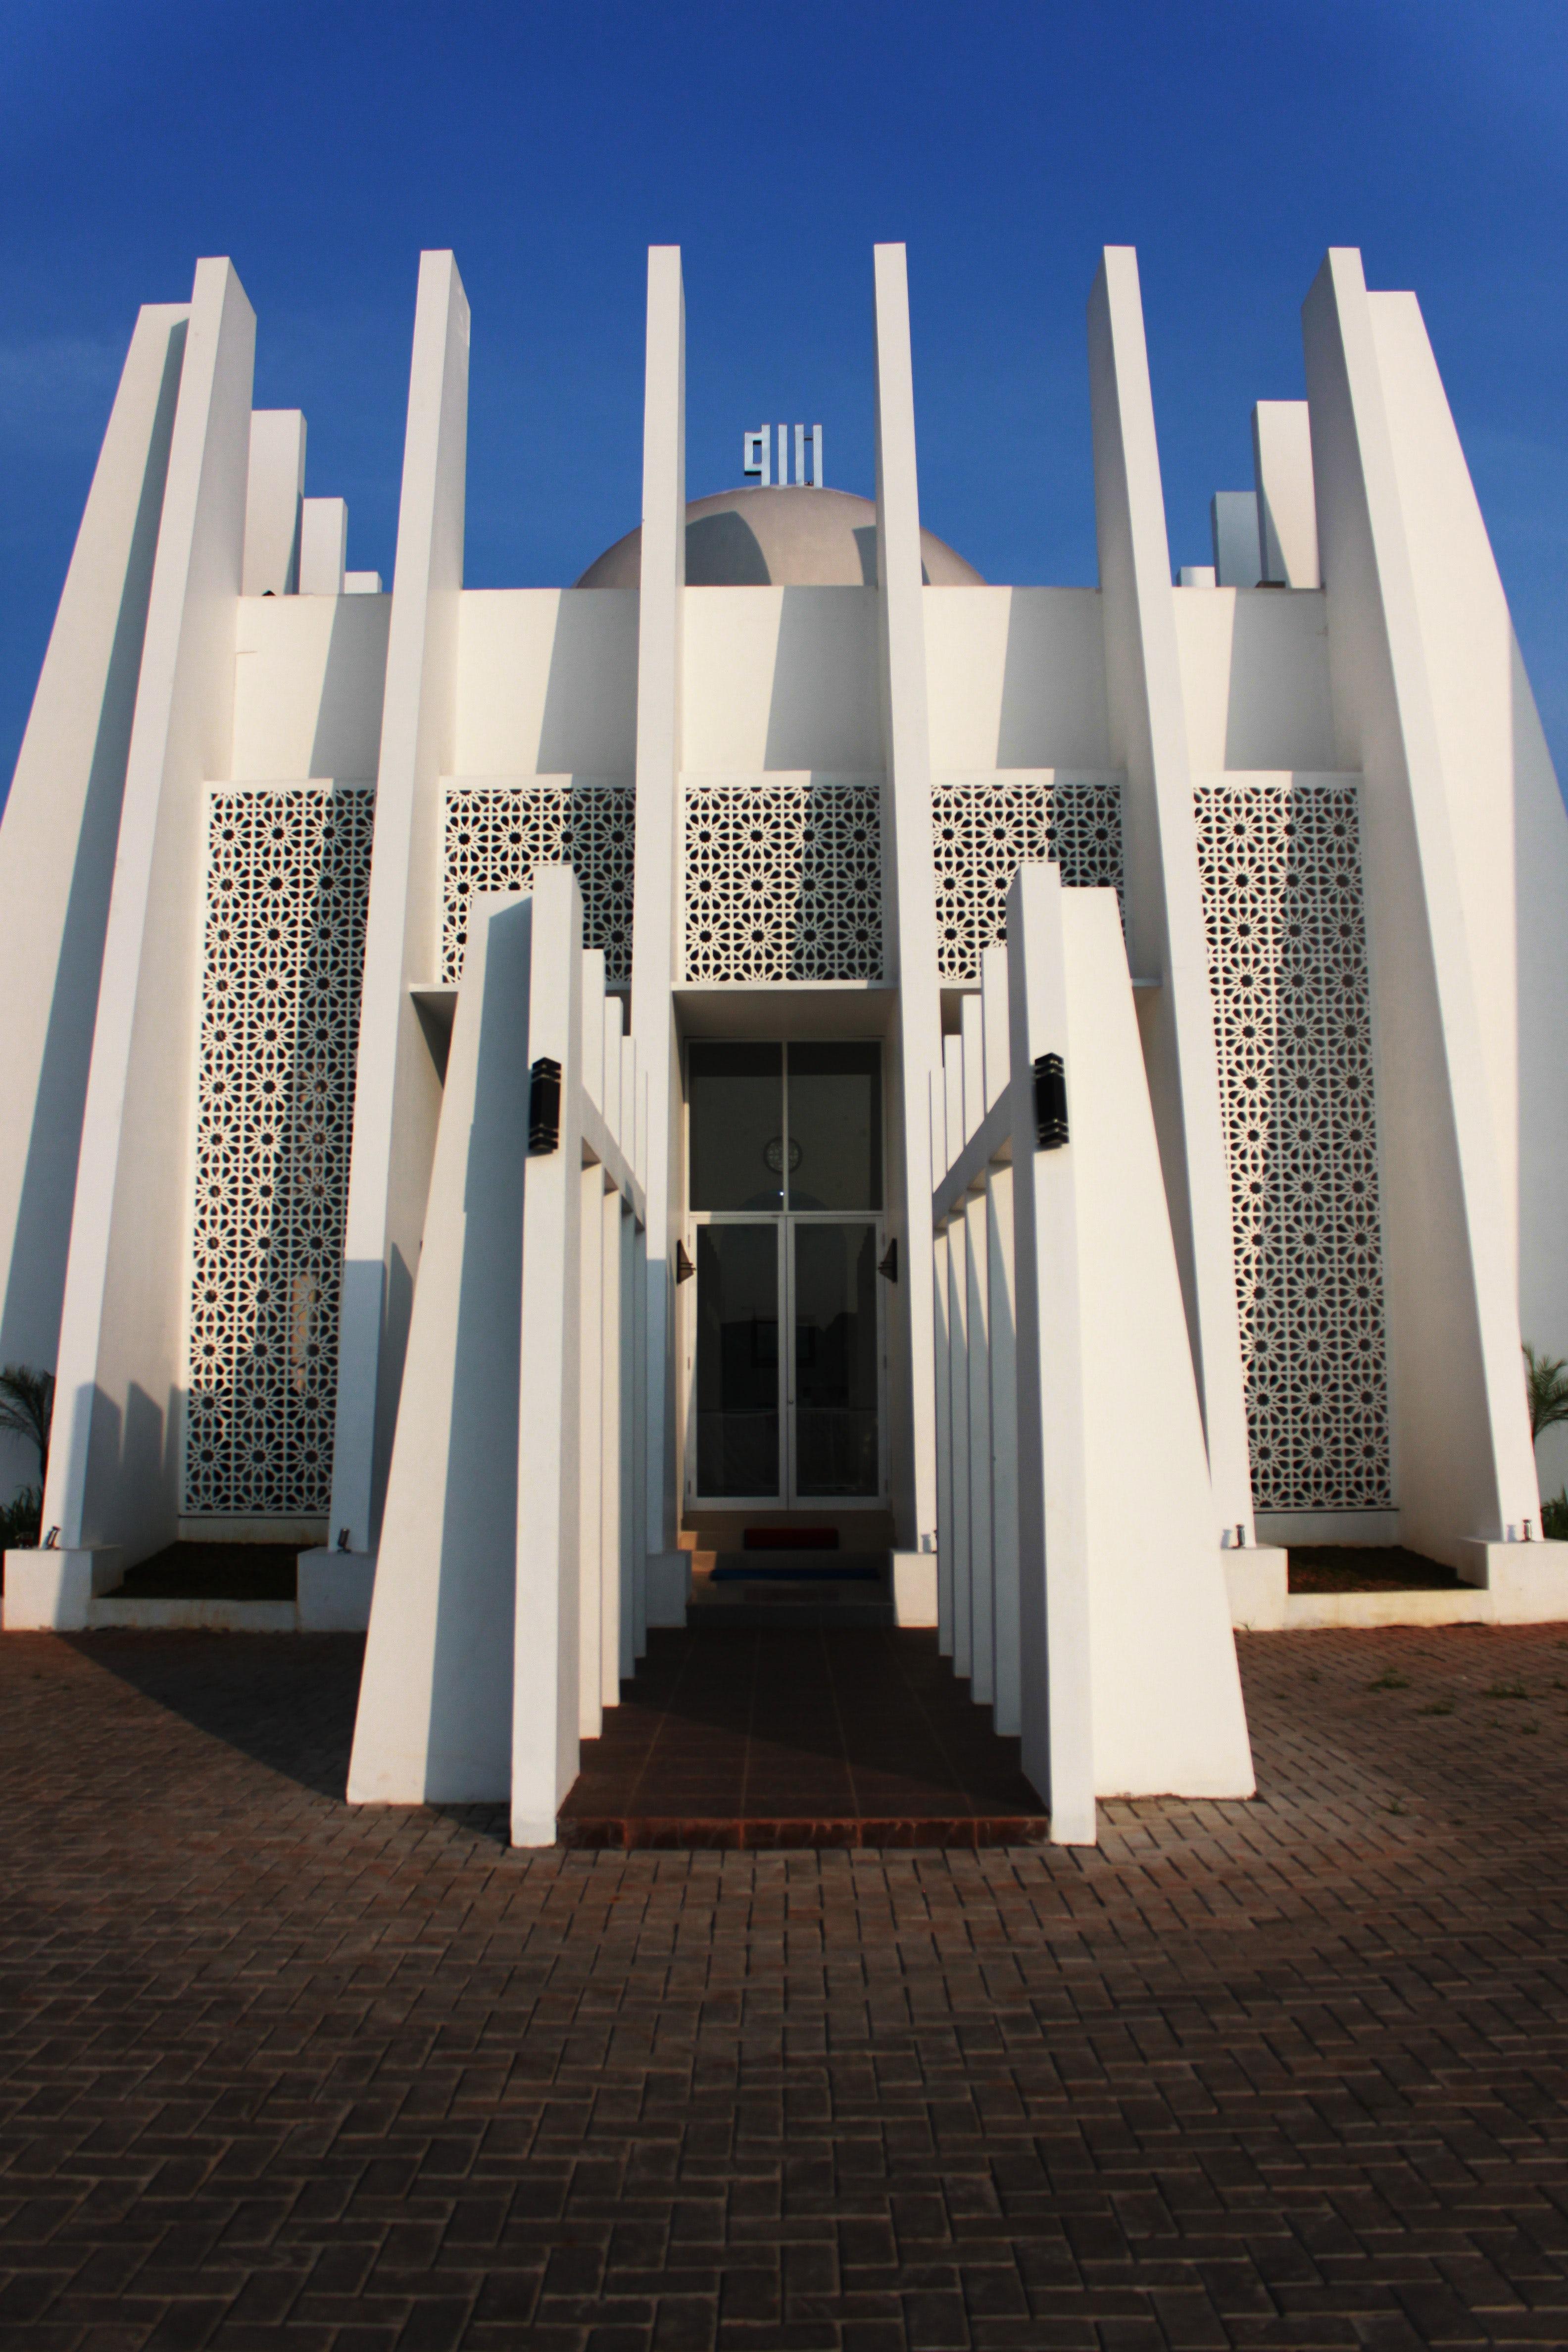 Radical Façades: 7 Modern Buildings Hidden Behind Decorative Screens